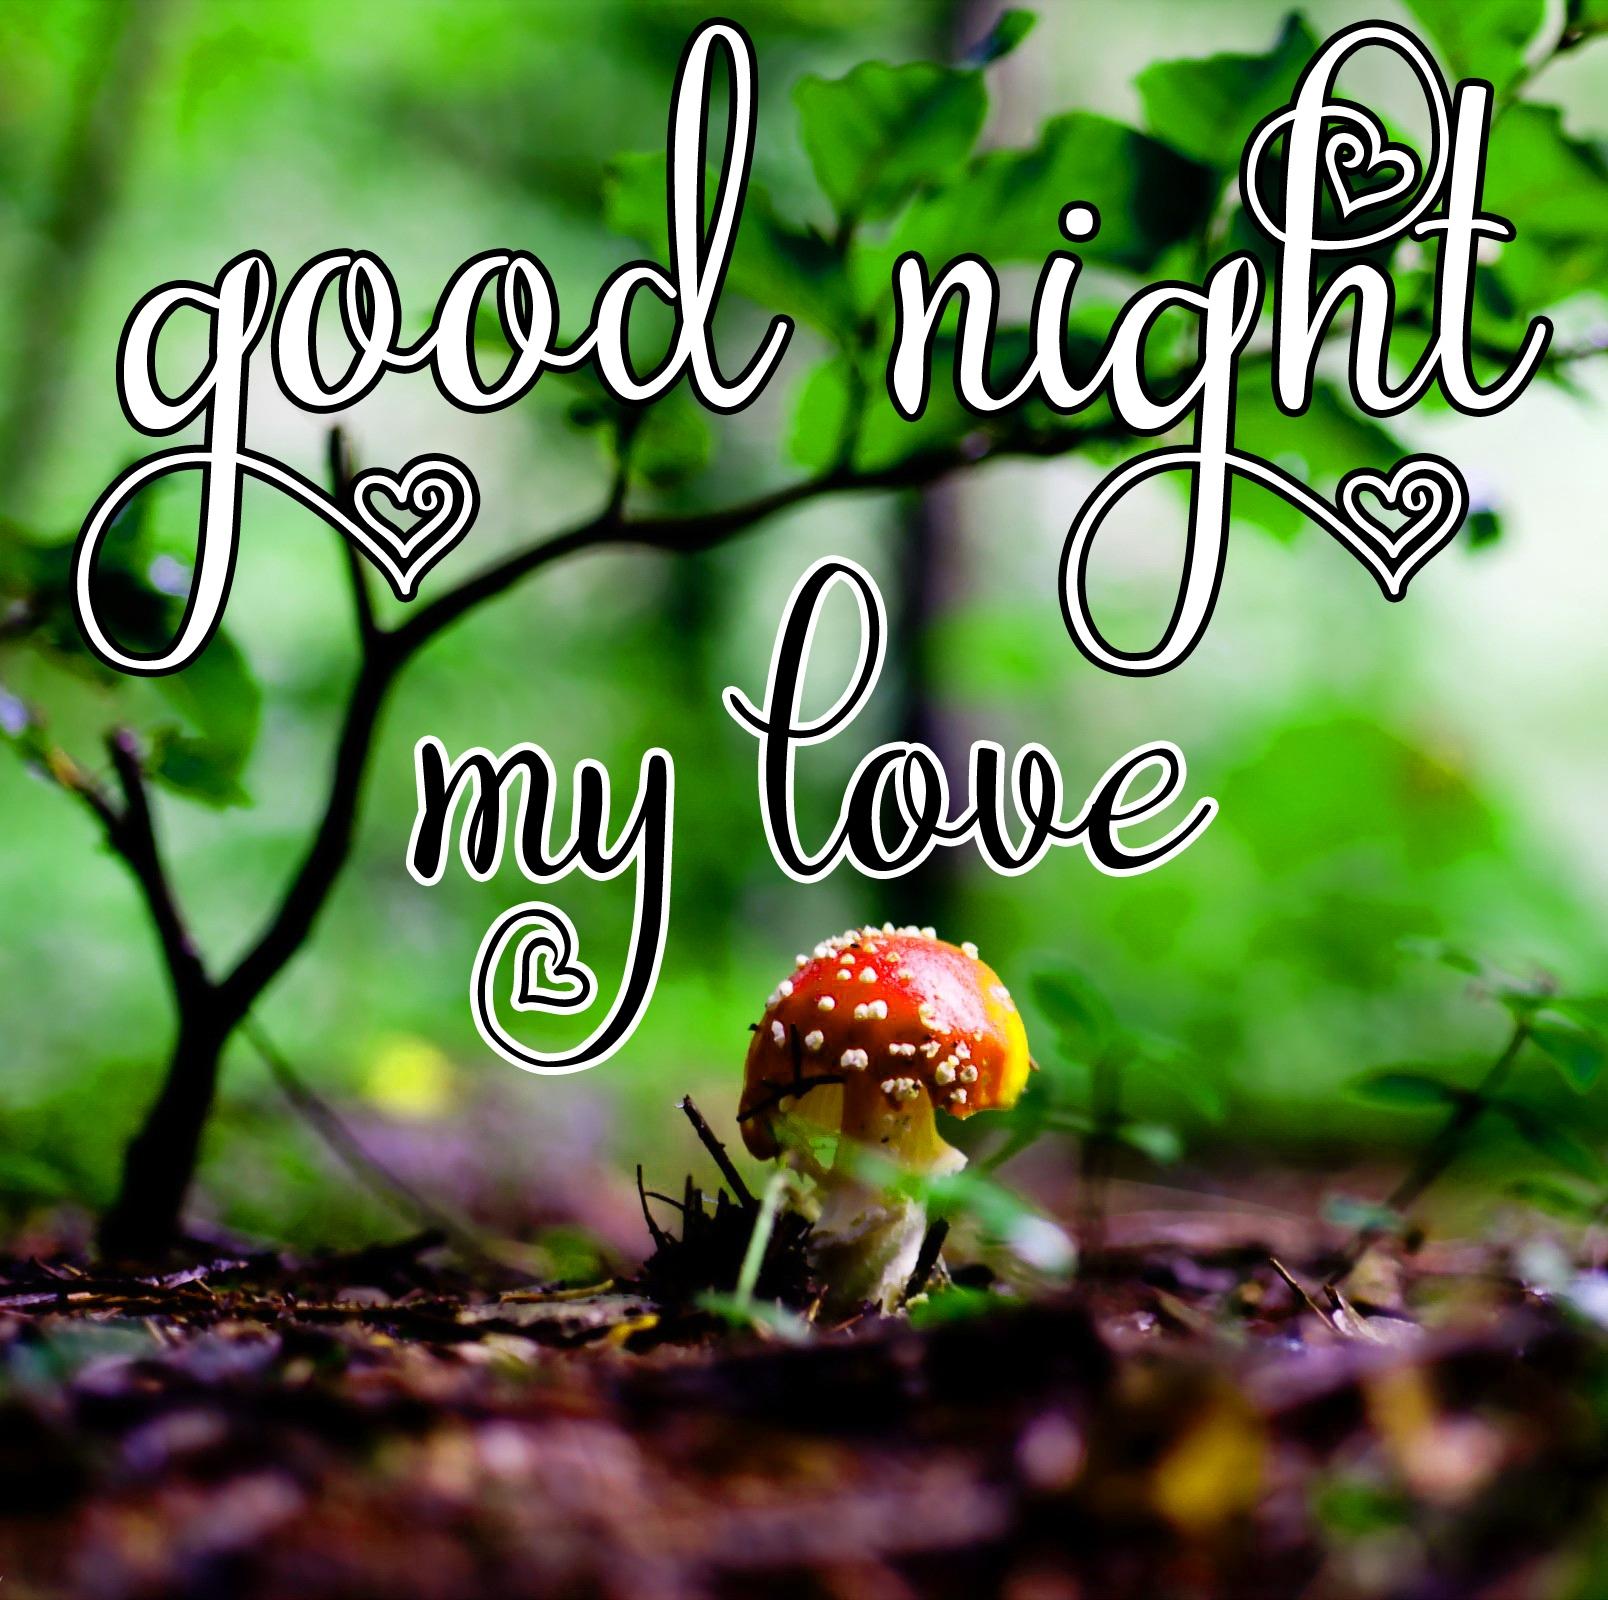 Free good night Images 51